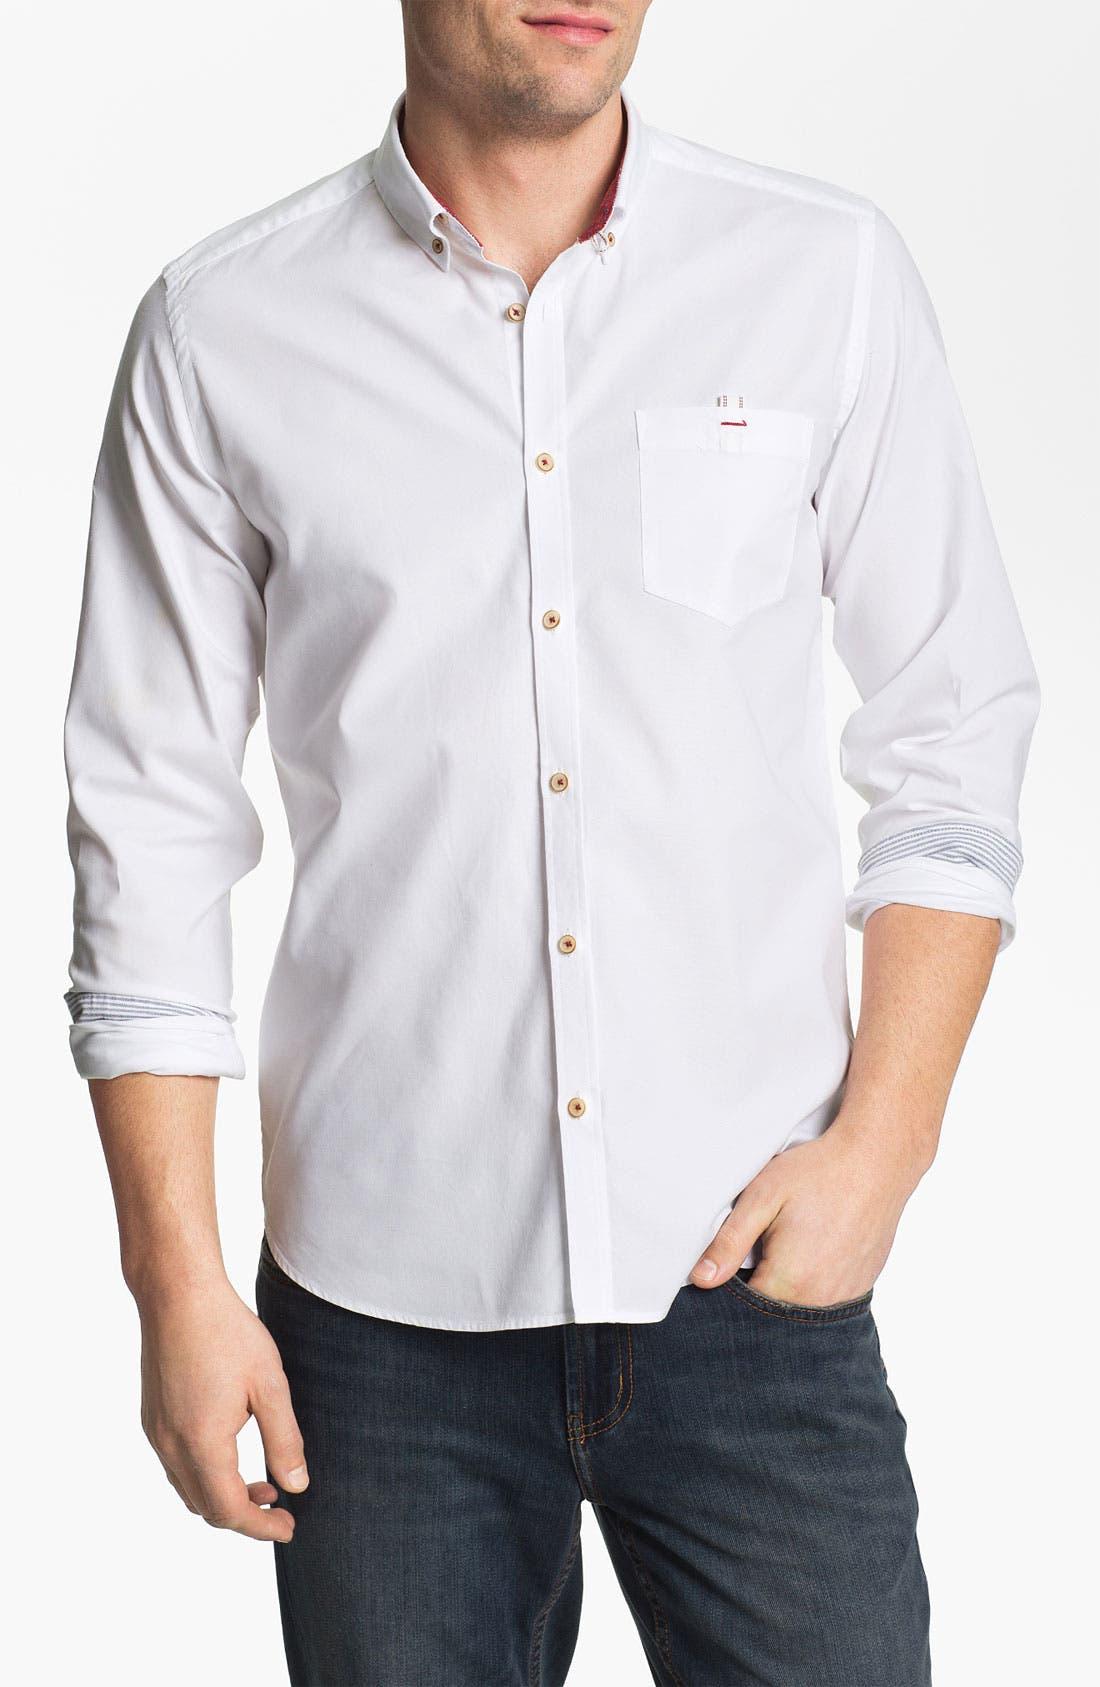 Main Image - HUGO Sportcoat, Ted Baker London Sport Shirt & Baldwin Jeans